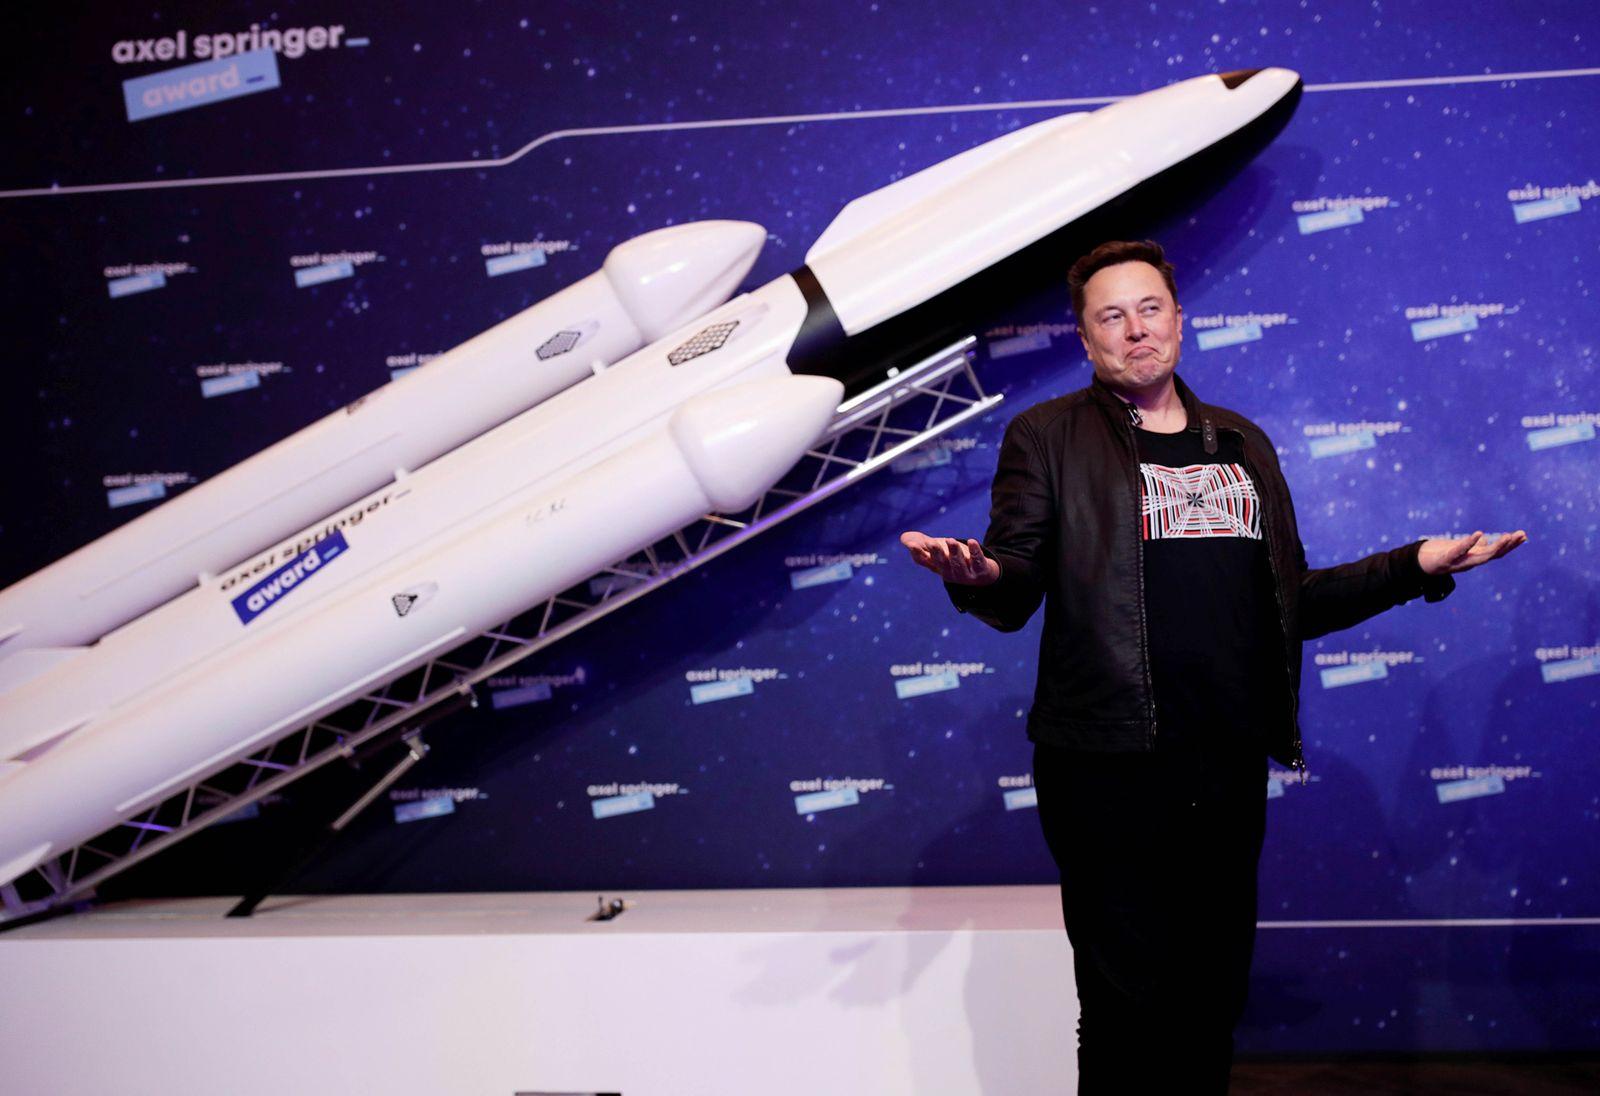 Elon Musk Awarded With Axel Springer Award 2020 In Berlin